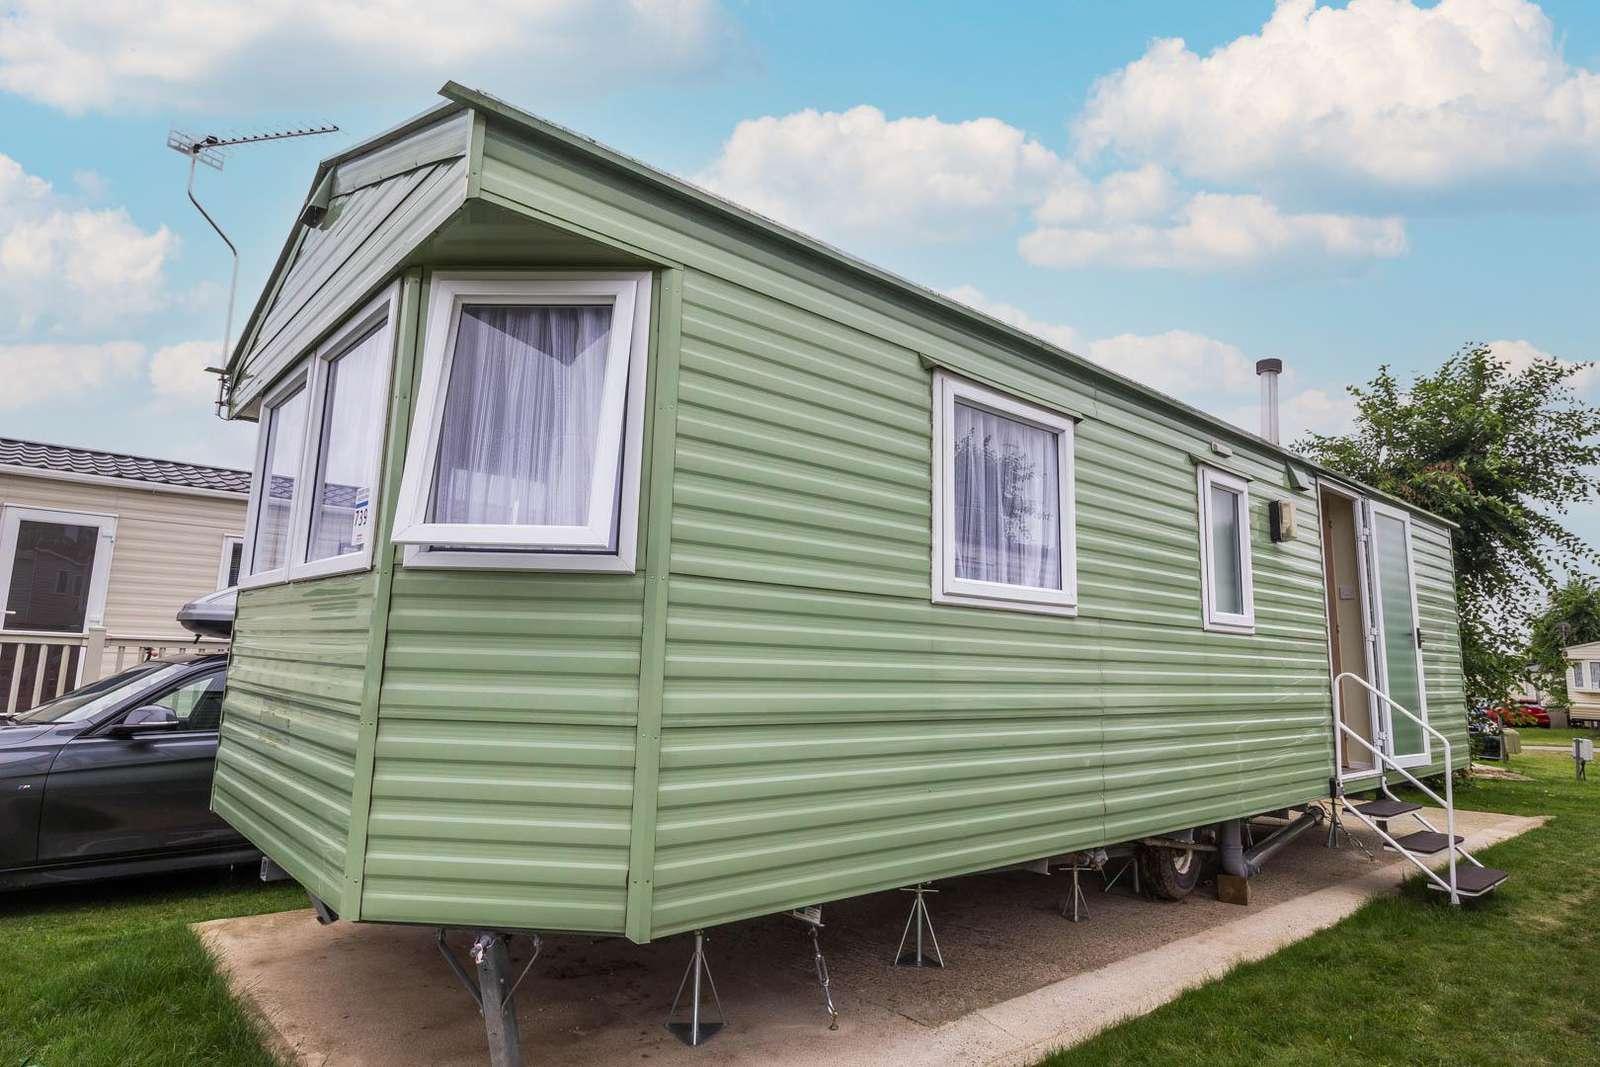 70739C – Cherry Tree, 2 bed, 4 berth caravan. Emerald rated. - property